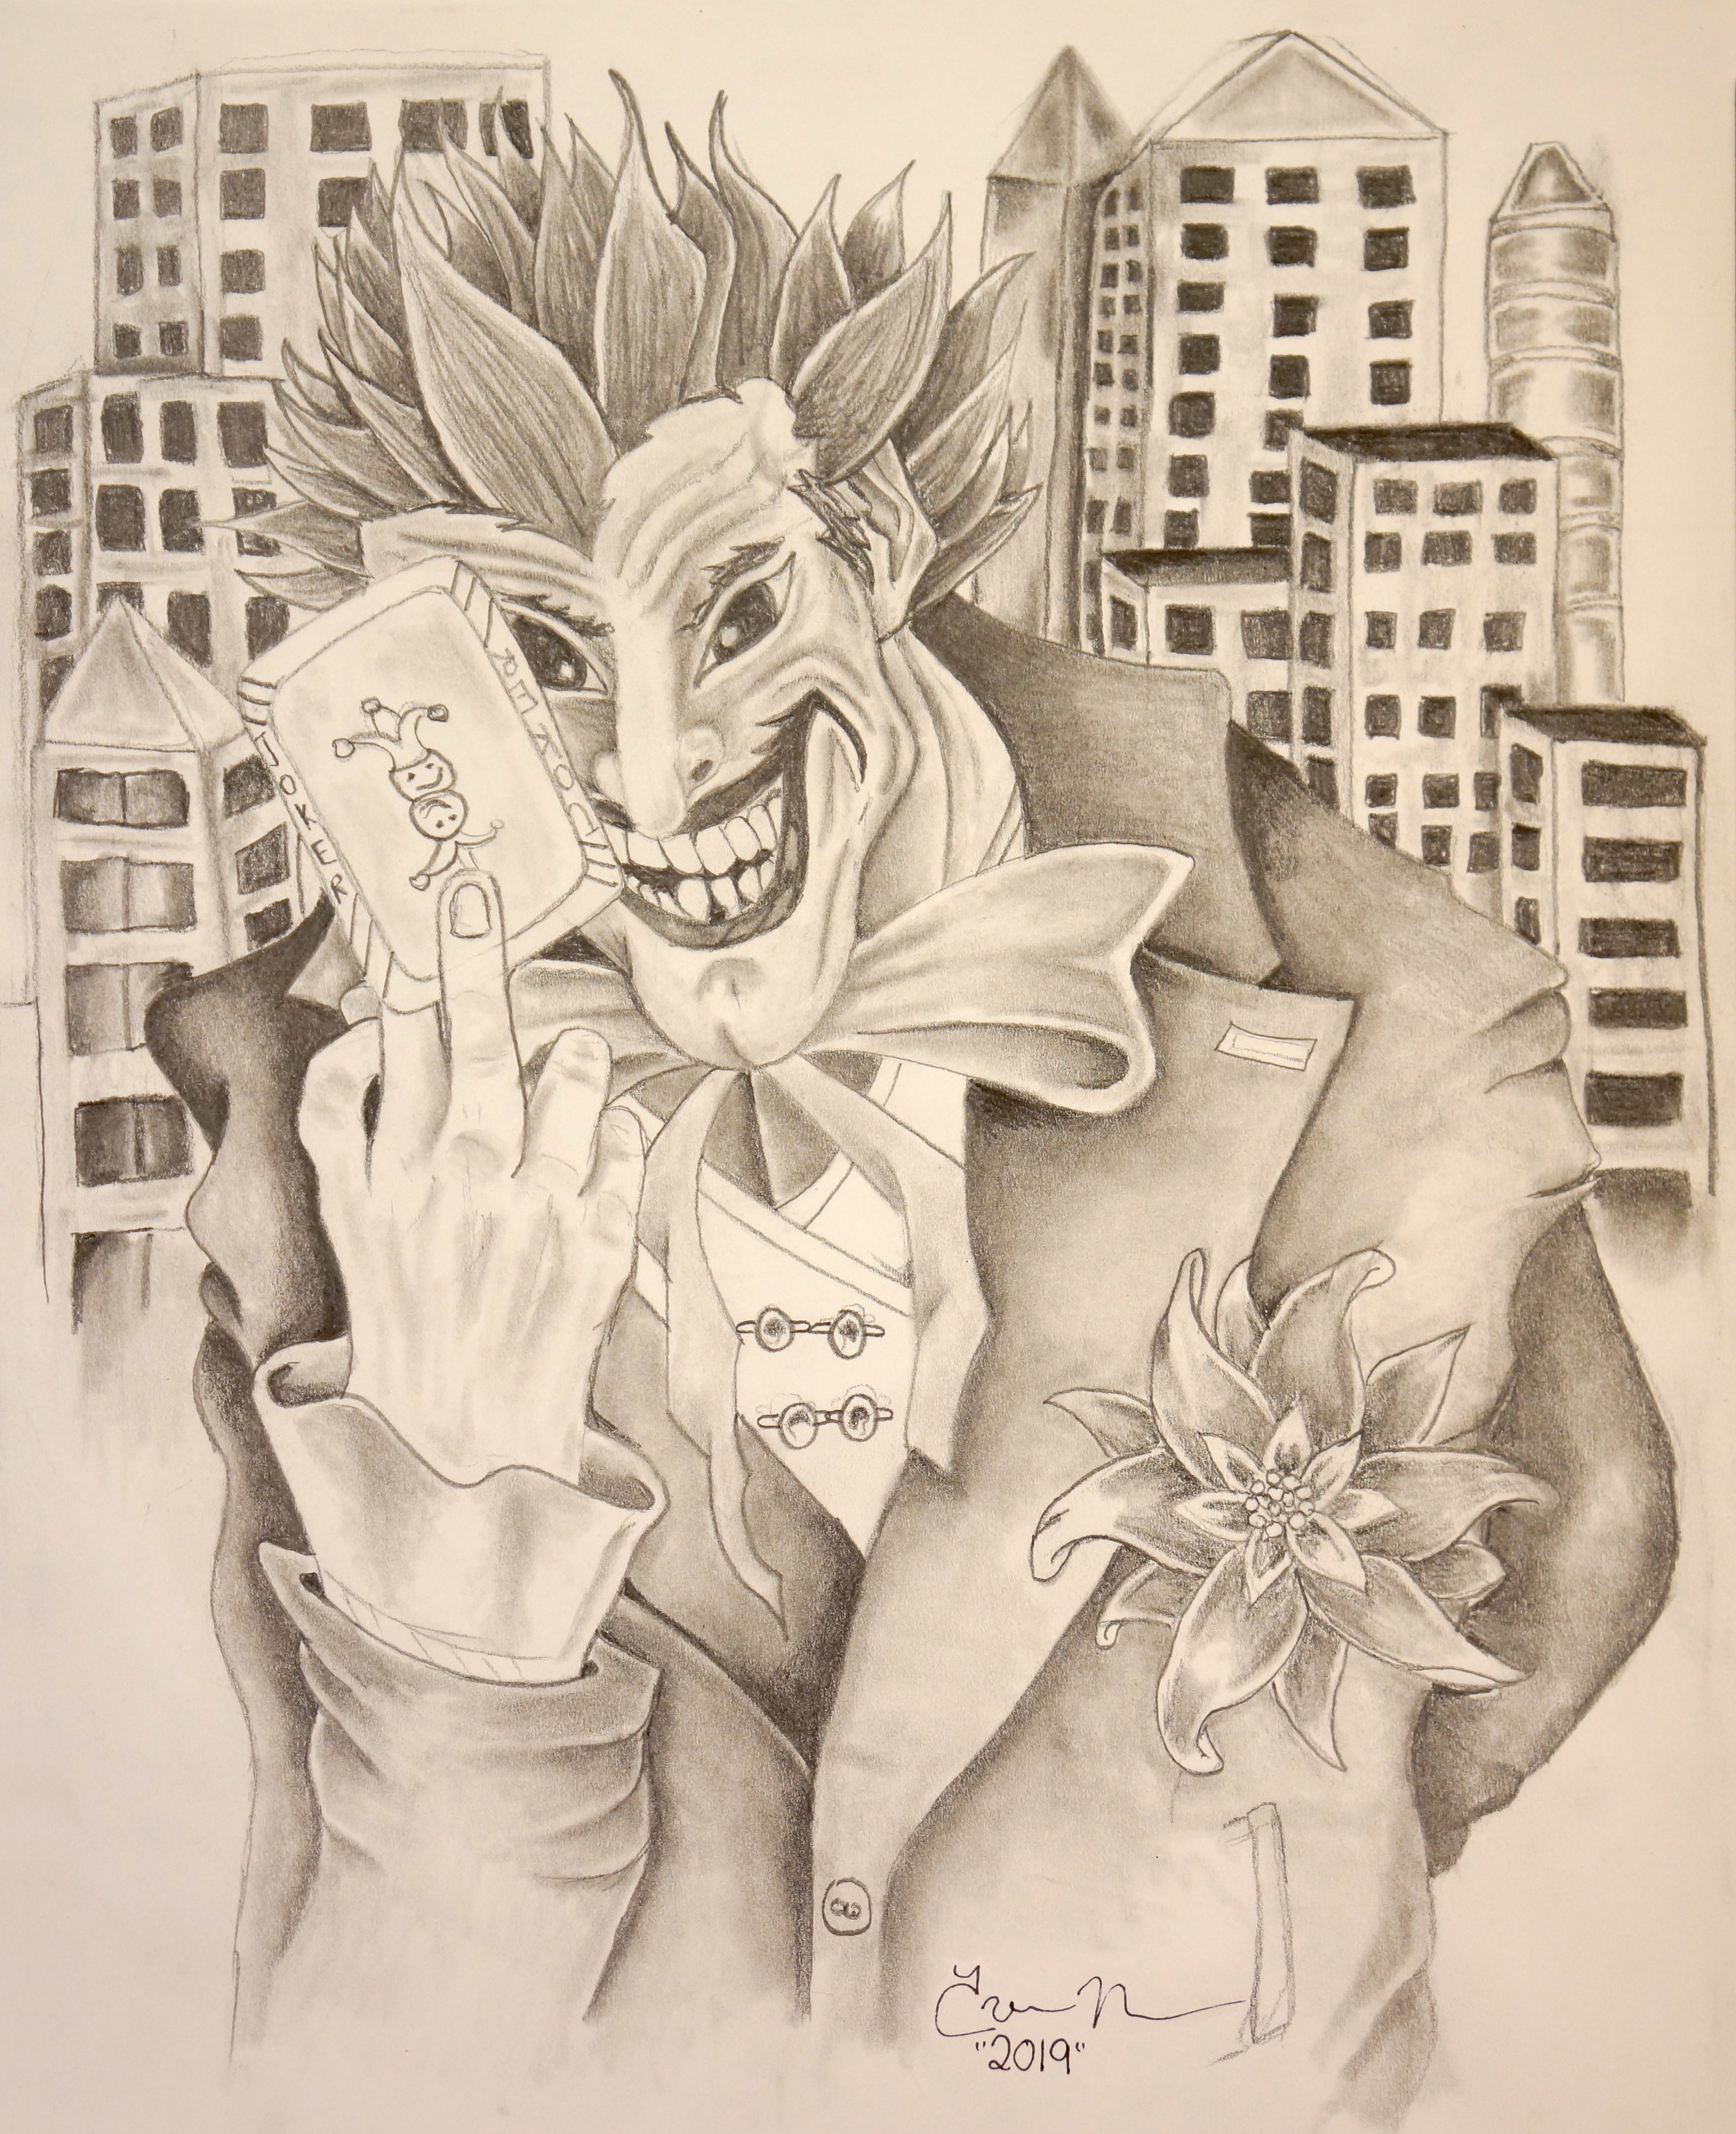 Artist: Trenton McCorkle